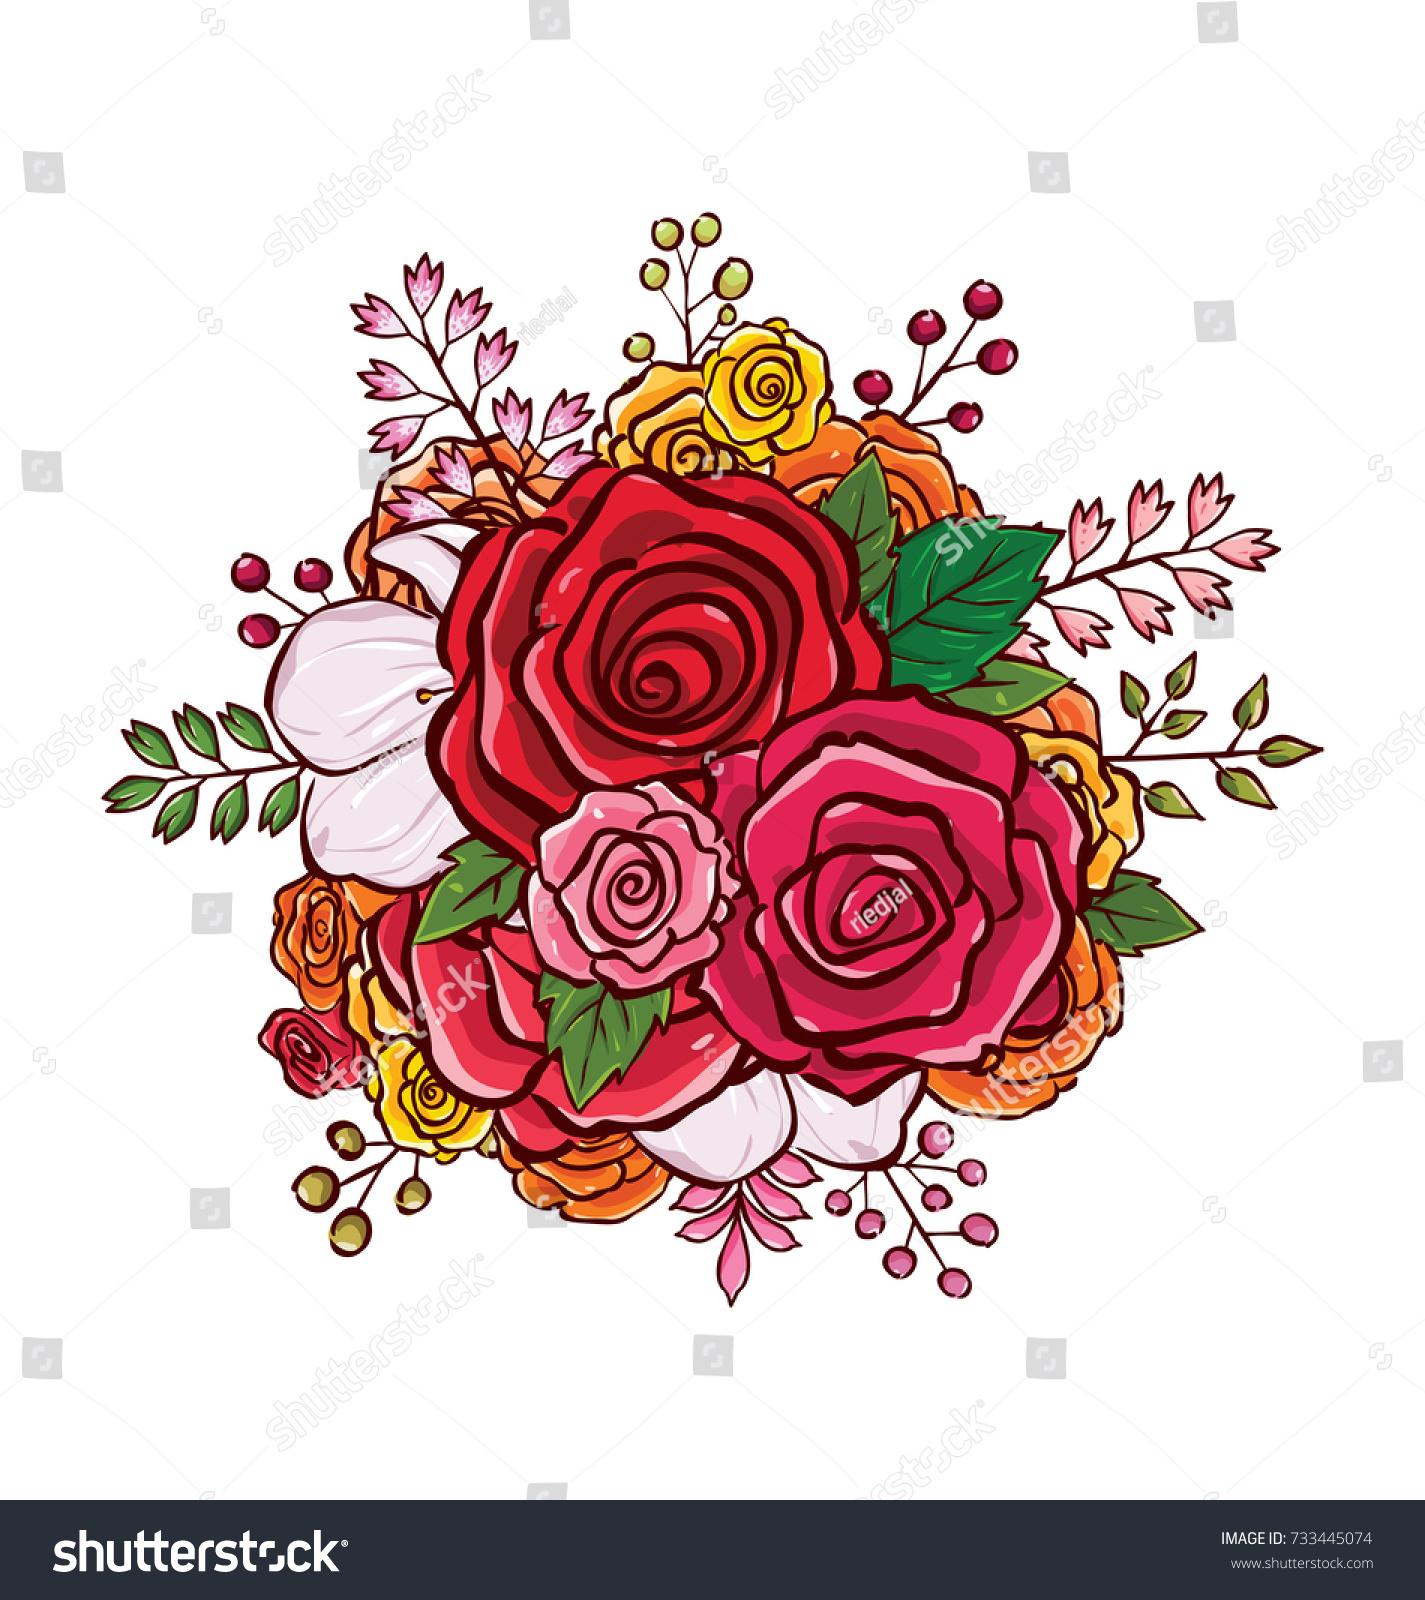 Flower Bouquet Vector Illustration Stock Vector 2018 733445074